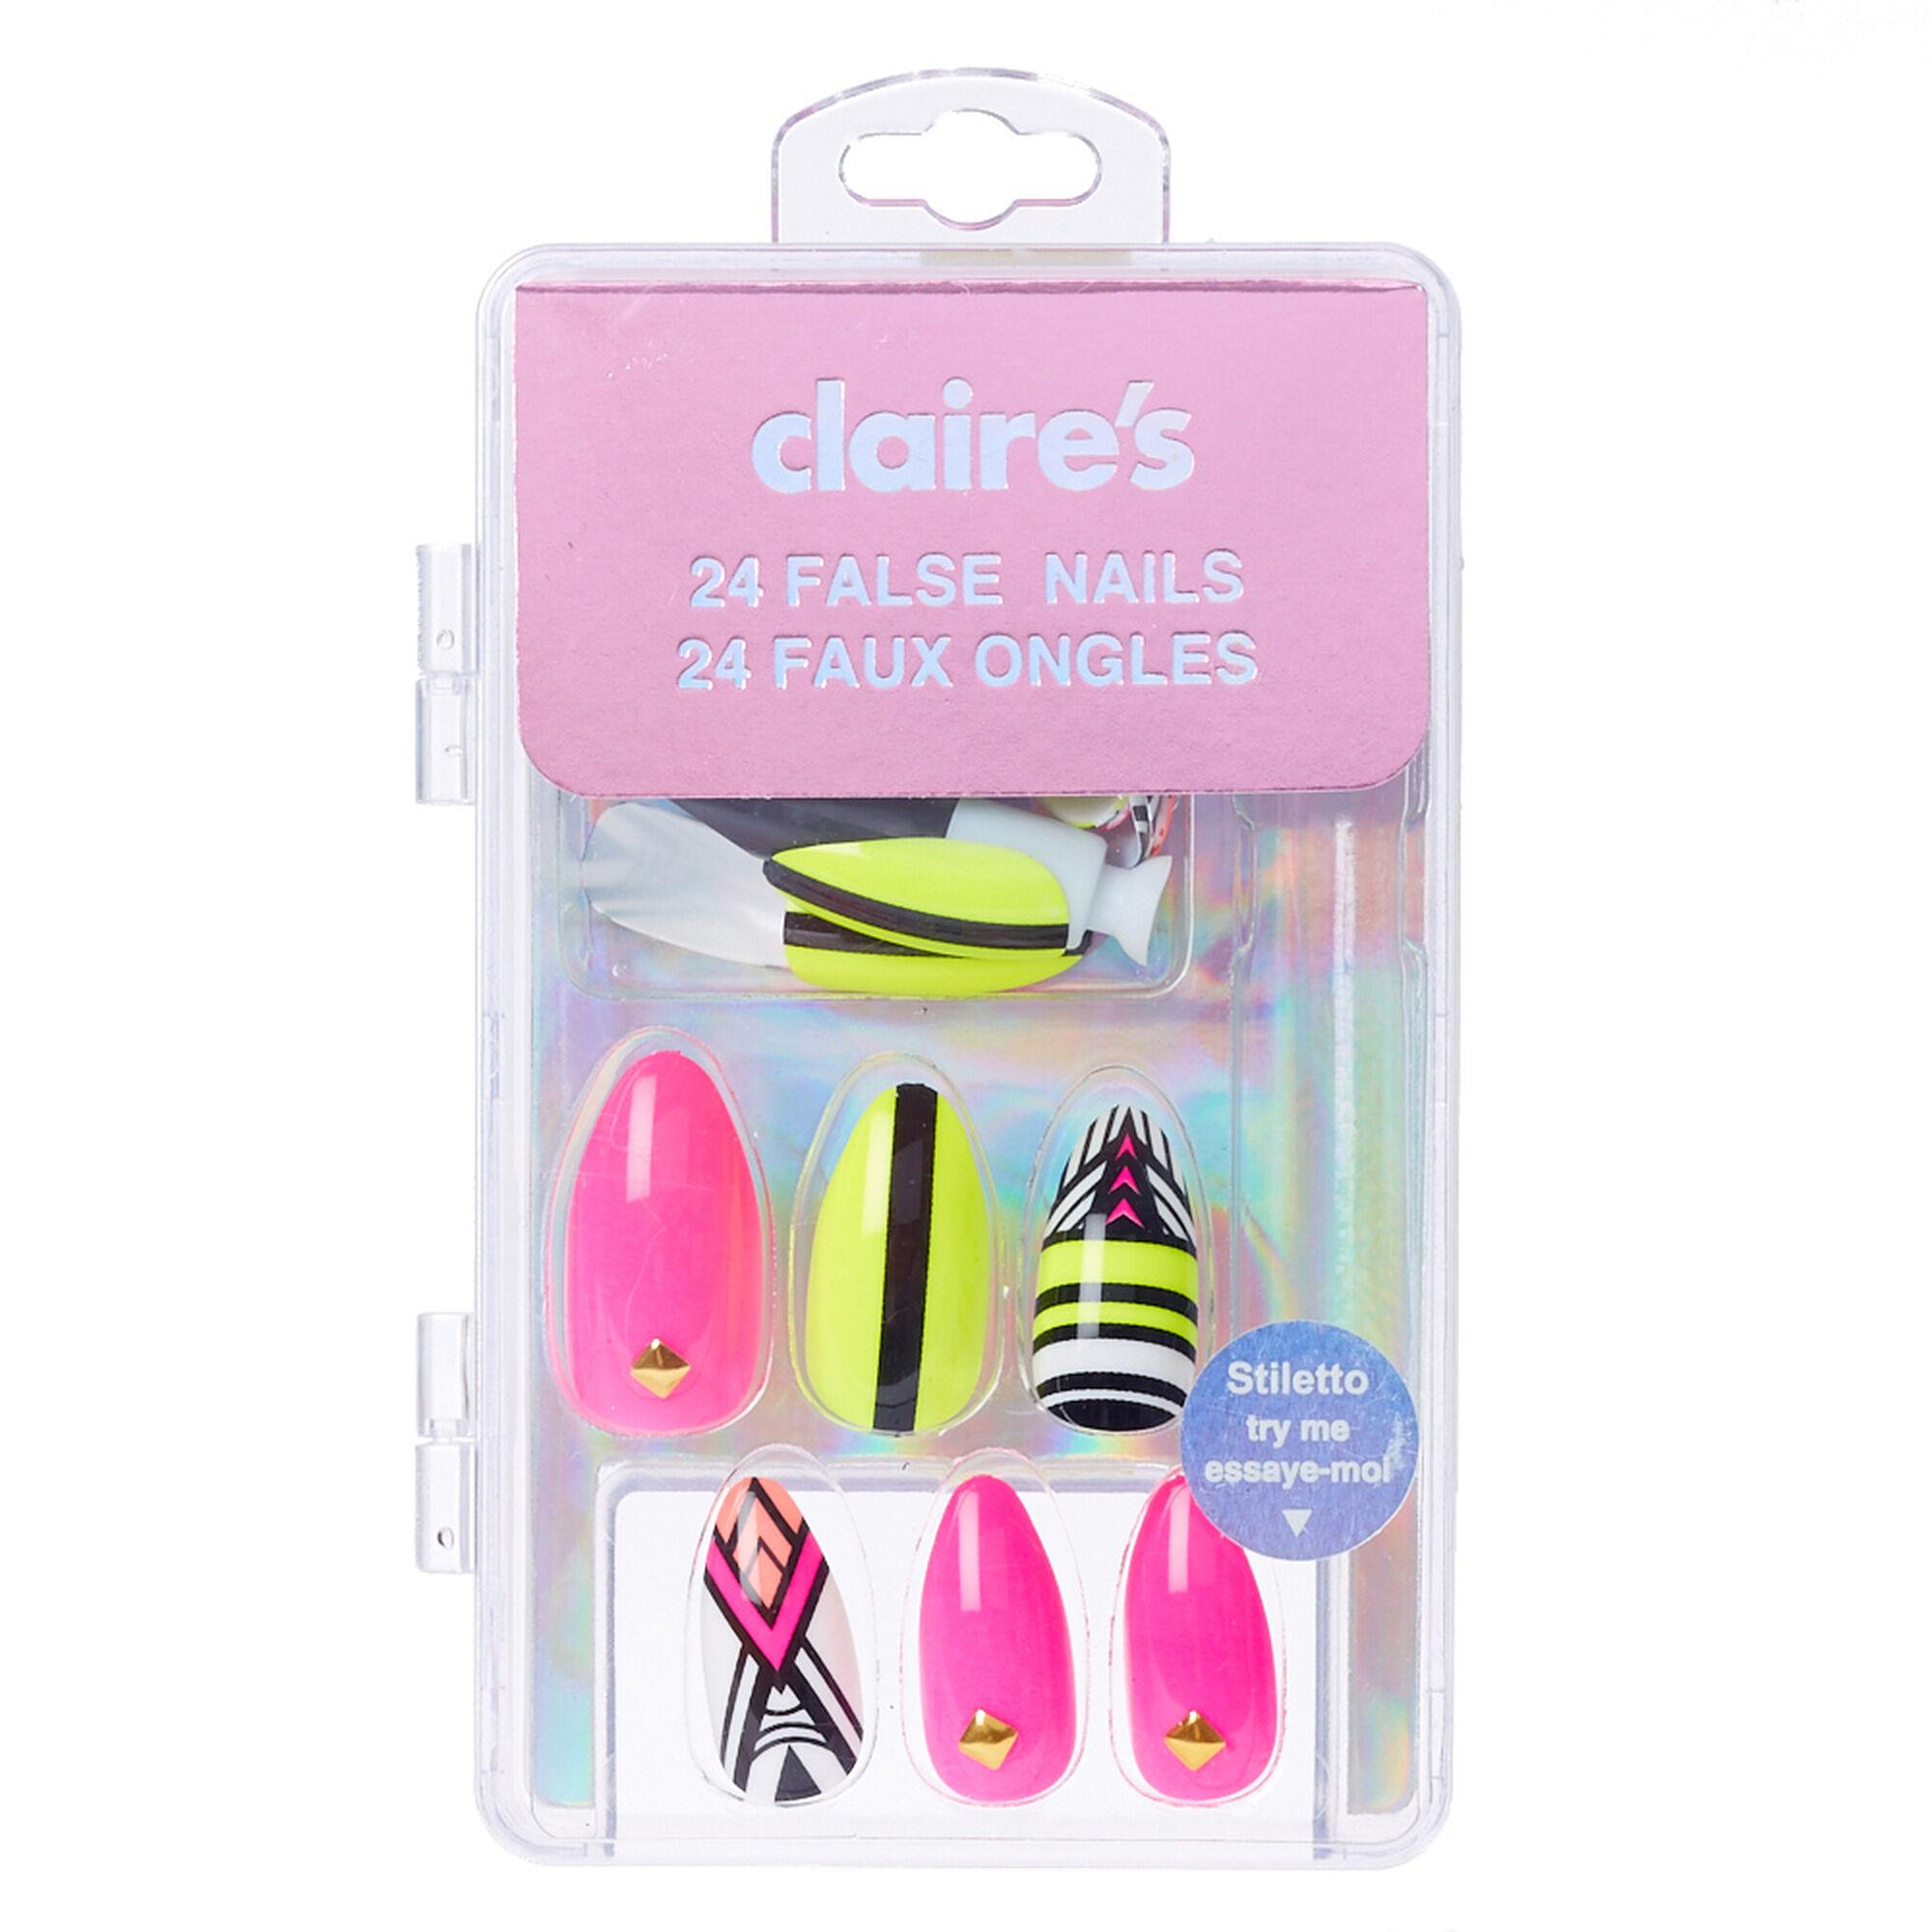 Popular fashion nails uxbridge - Neon Aztec Stiletto Faux Nails